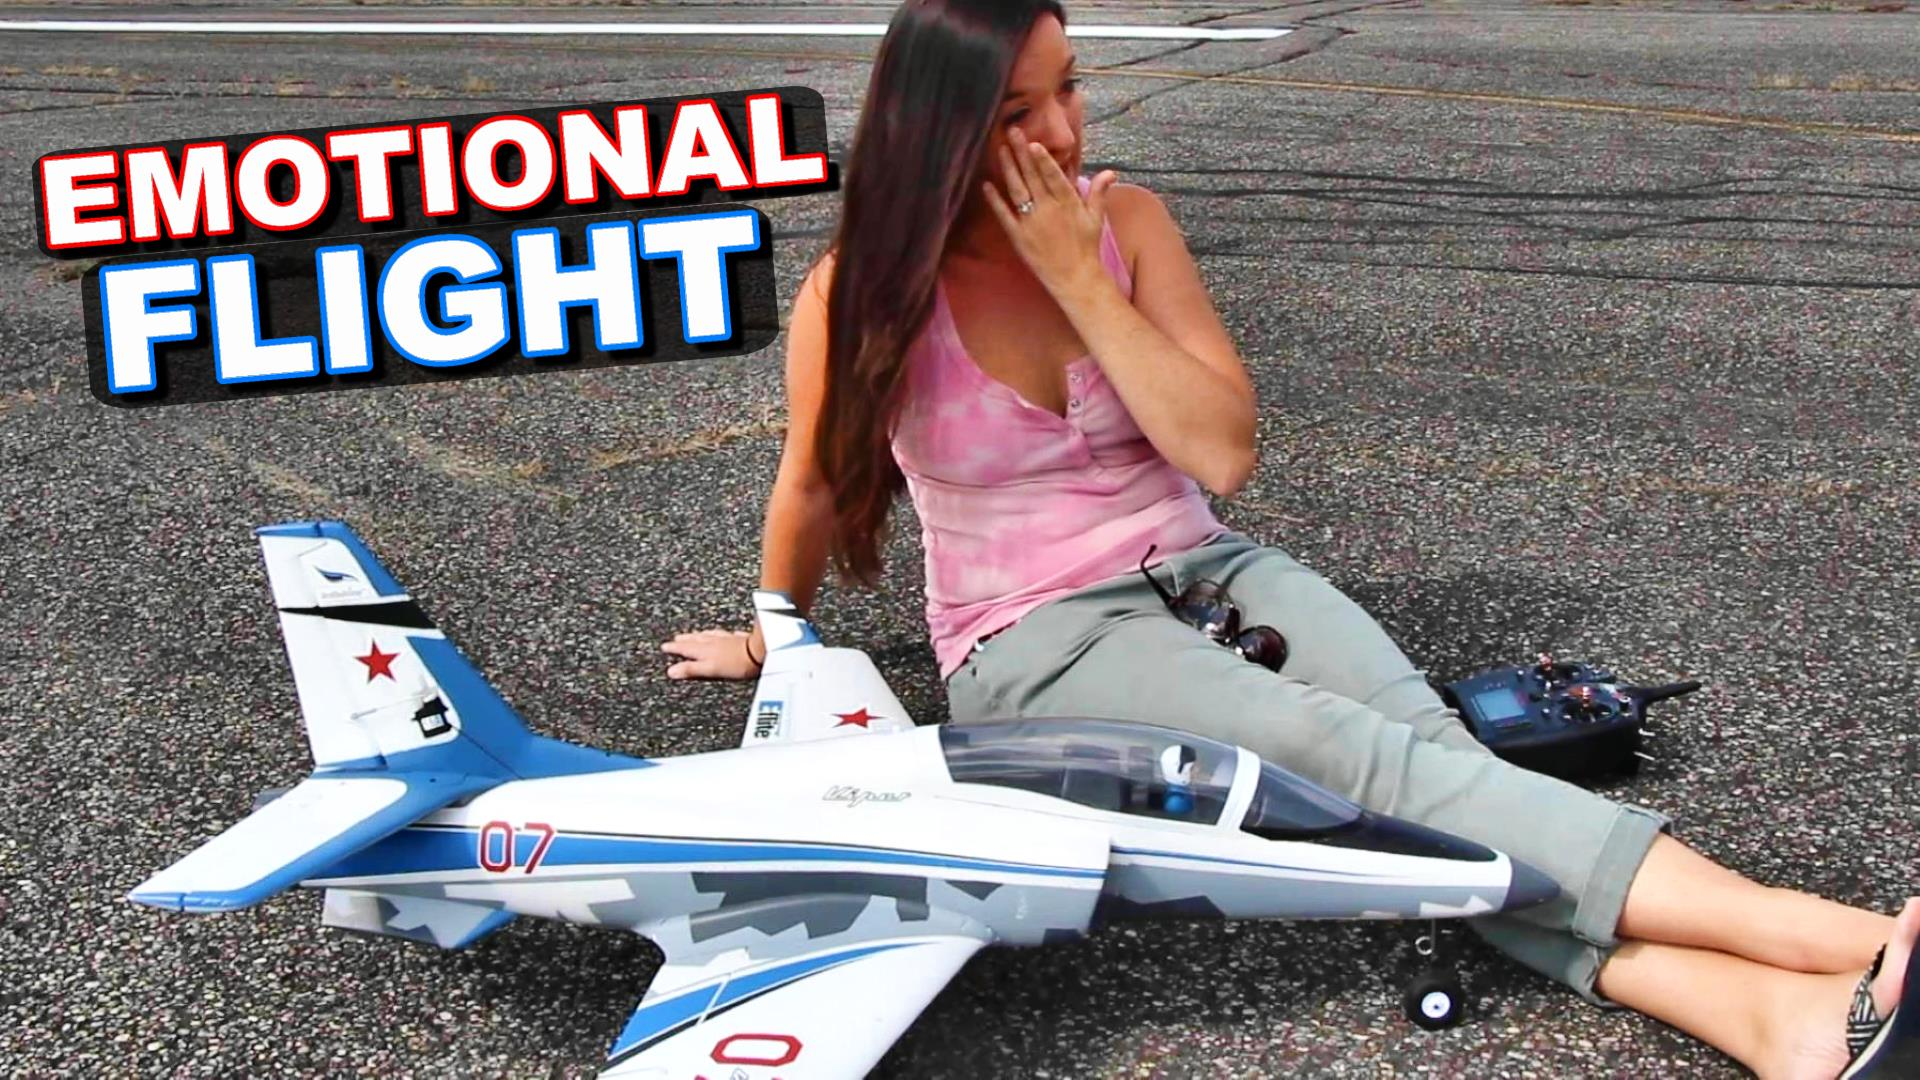 Abby Saylor emotional flight